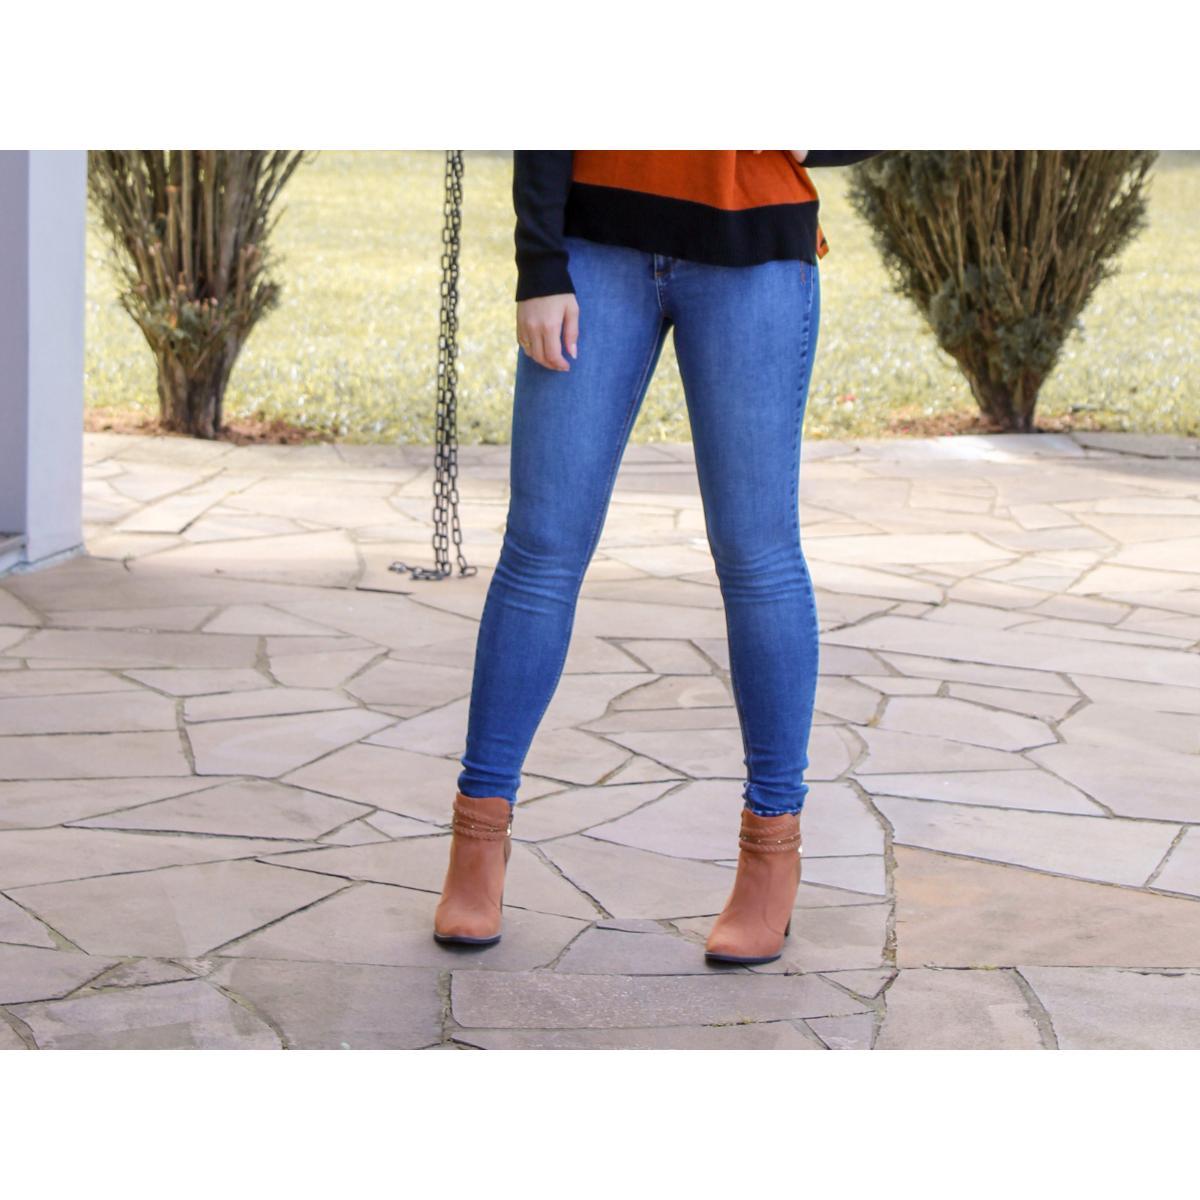 Calça Feminina Index 01.01.004974 Jeans